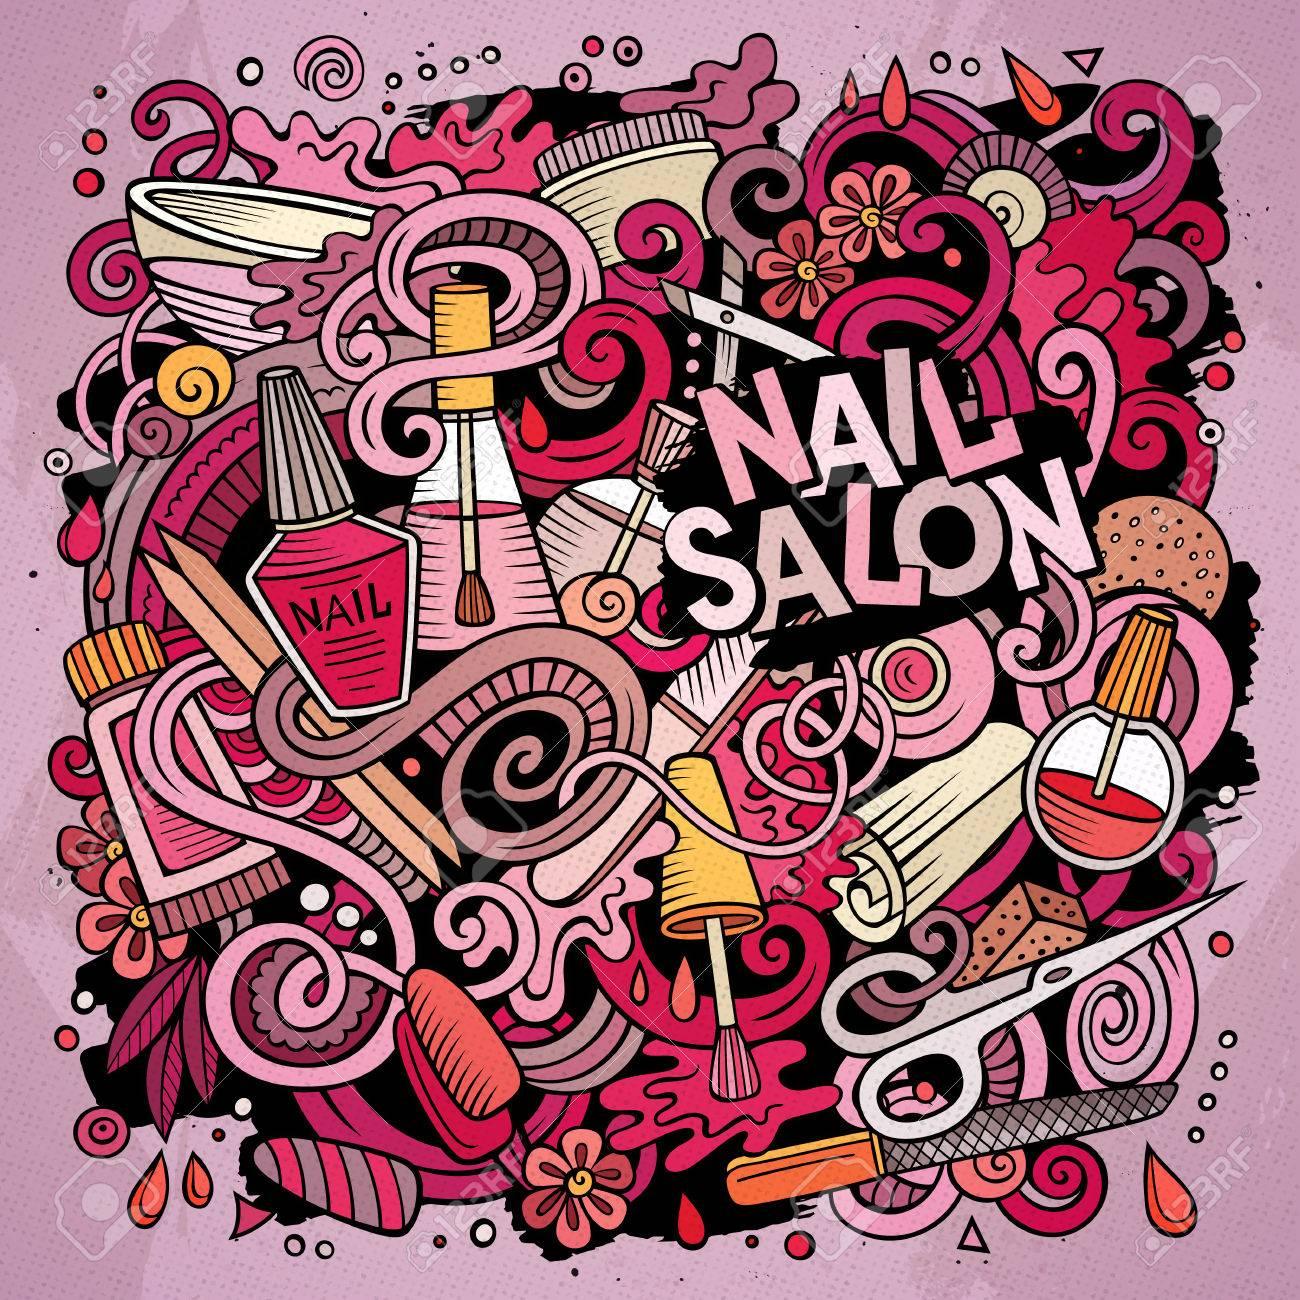 Cartoon Cute Doodles Hand Drawn Nail Salon Illustration. Colorful ...